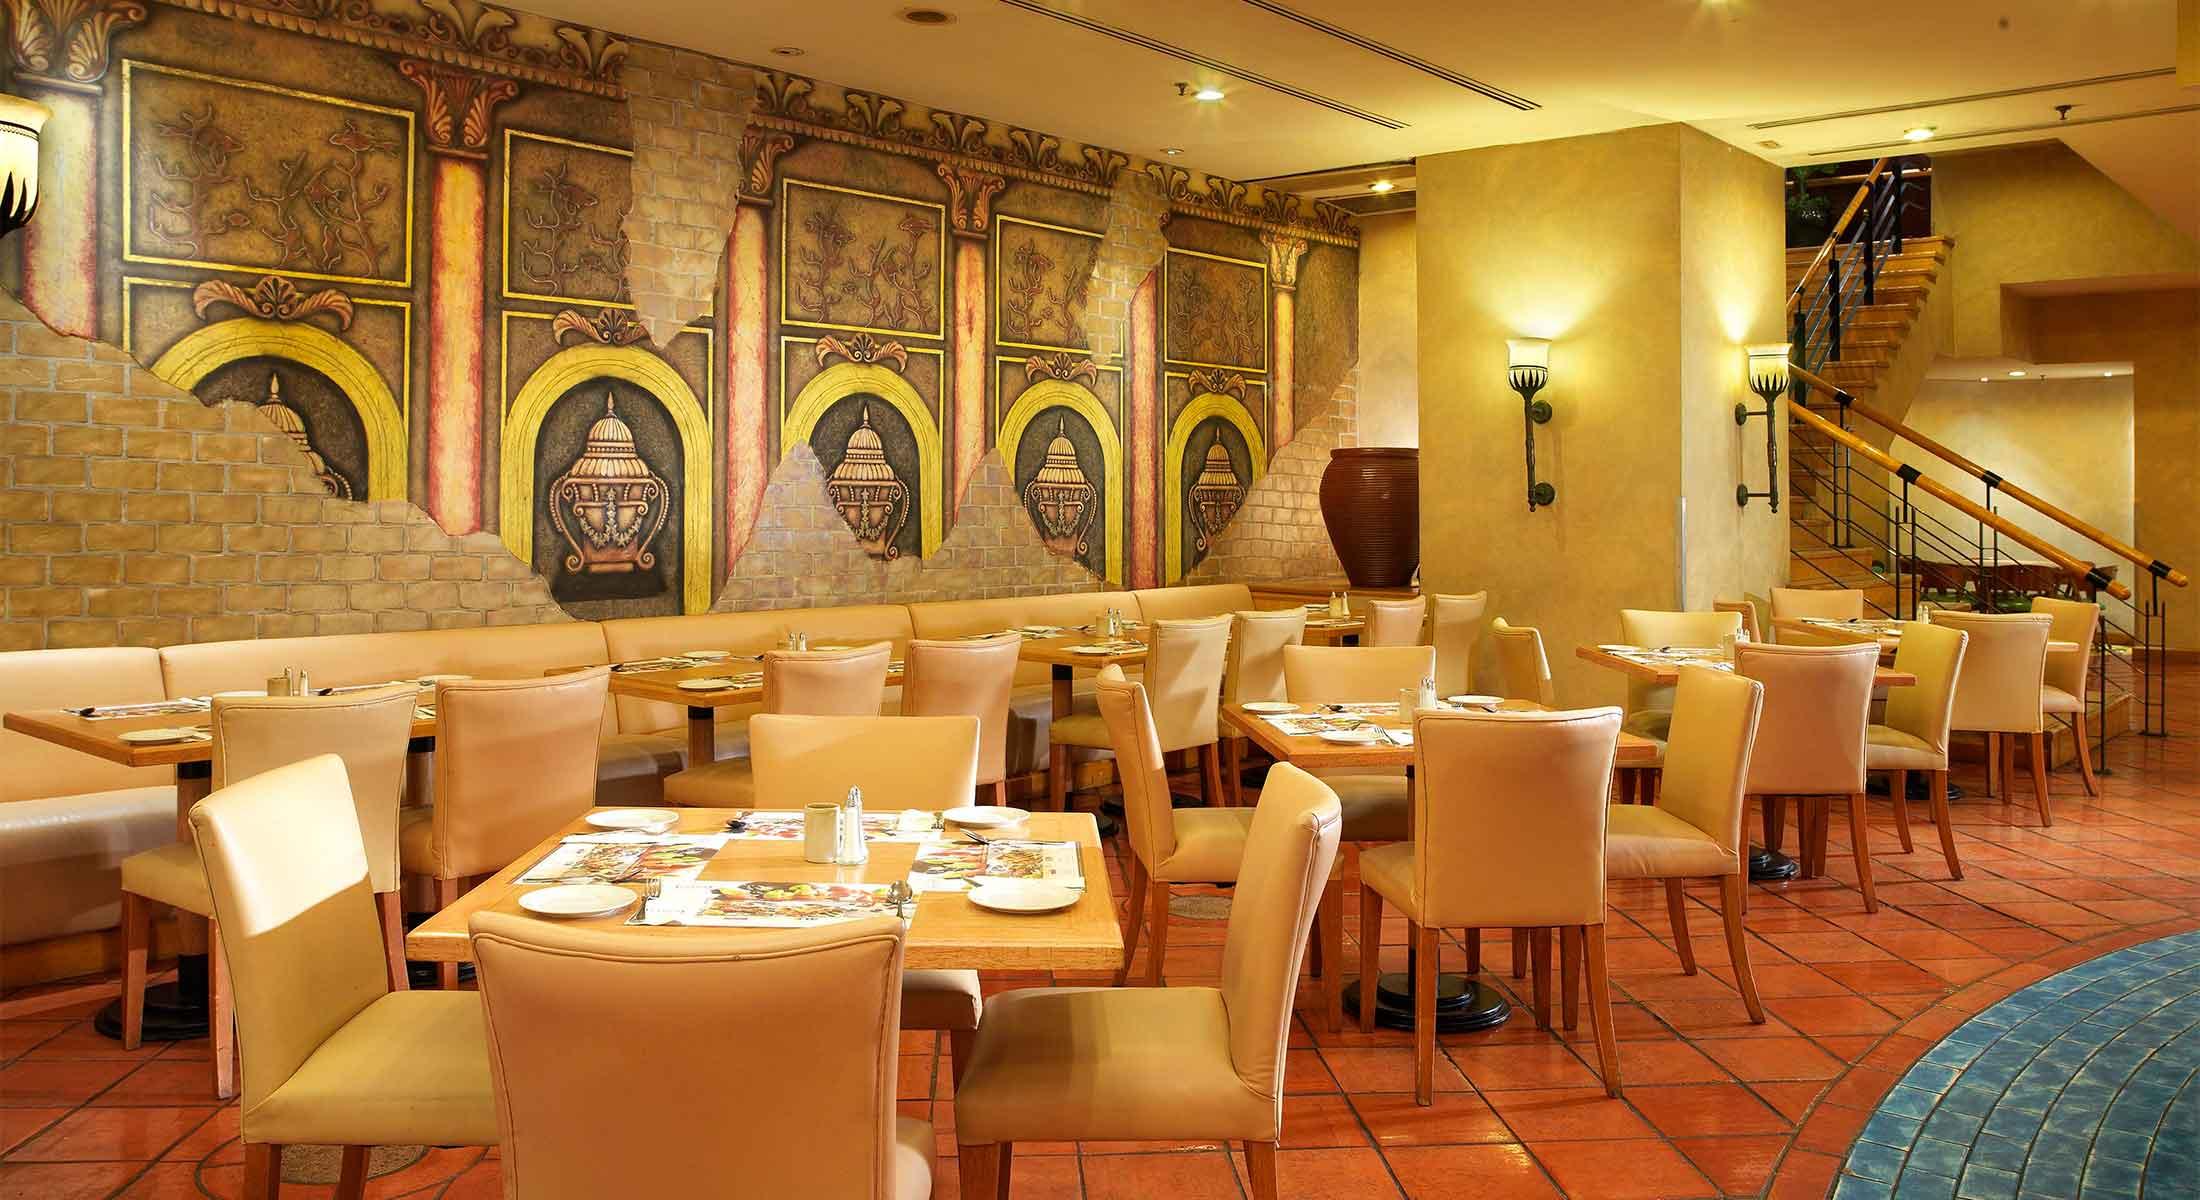 Shri rama spice indian restaurant atherton bolton uk